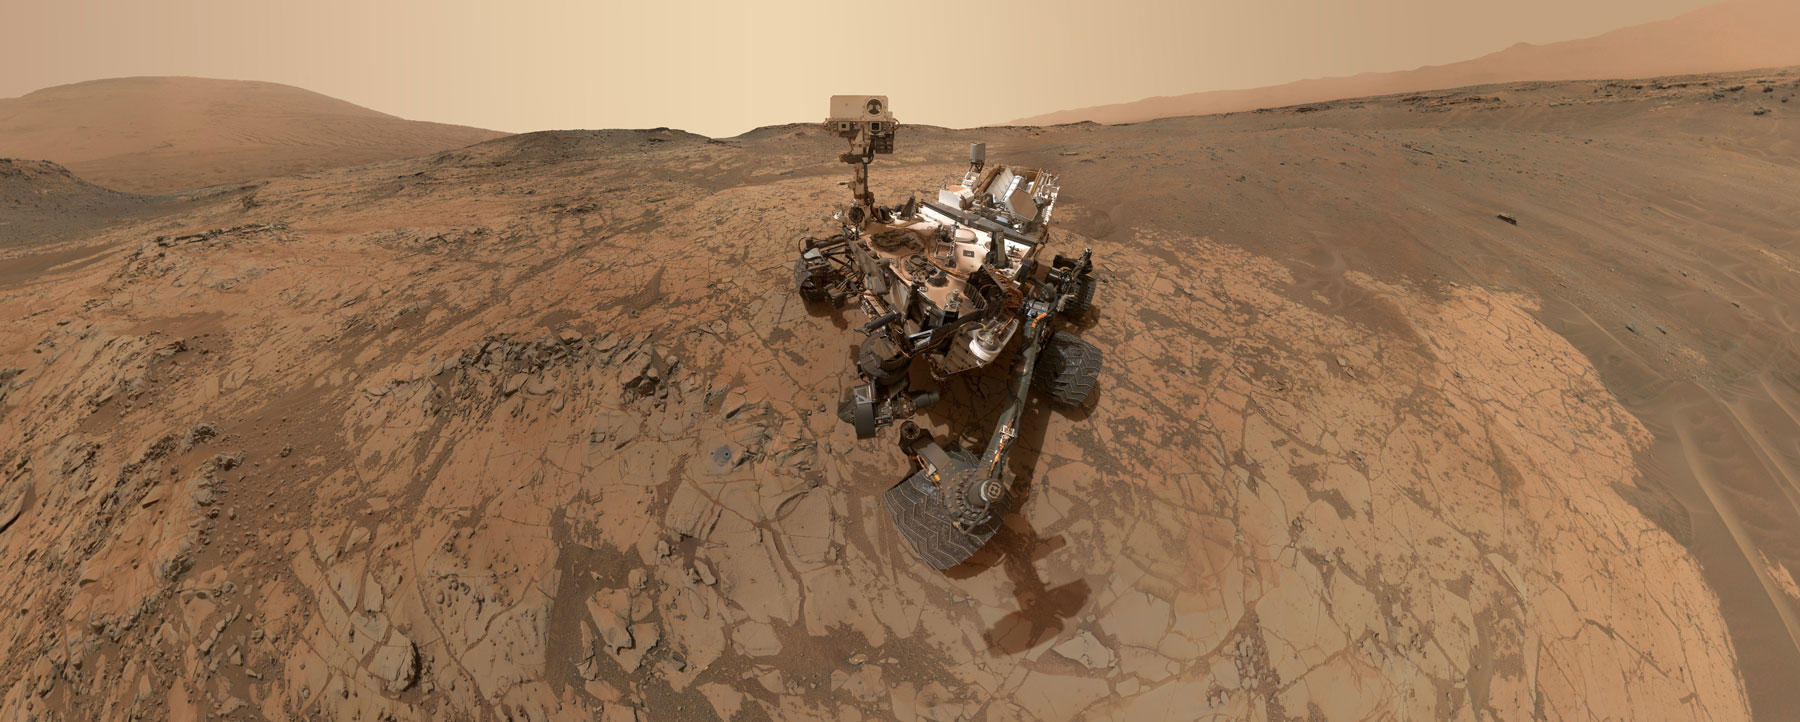 Curiosity's selfie